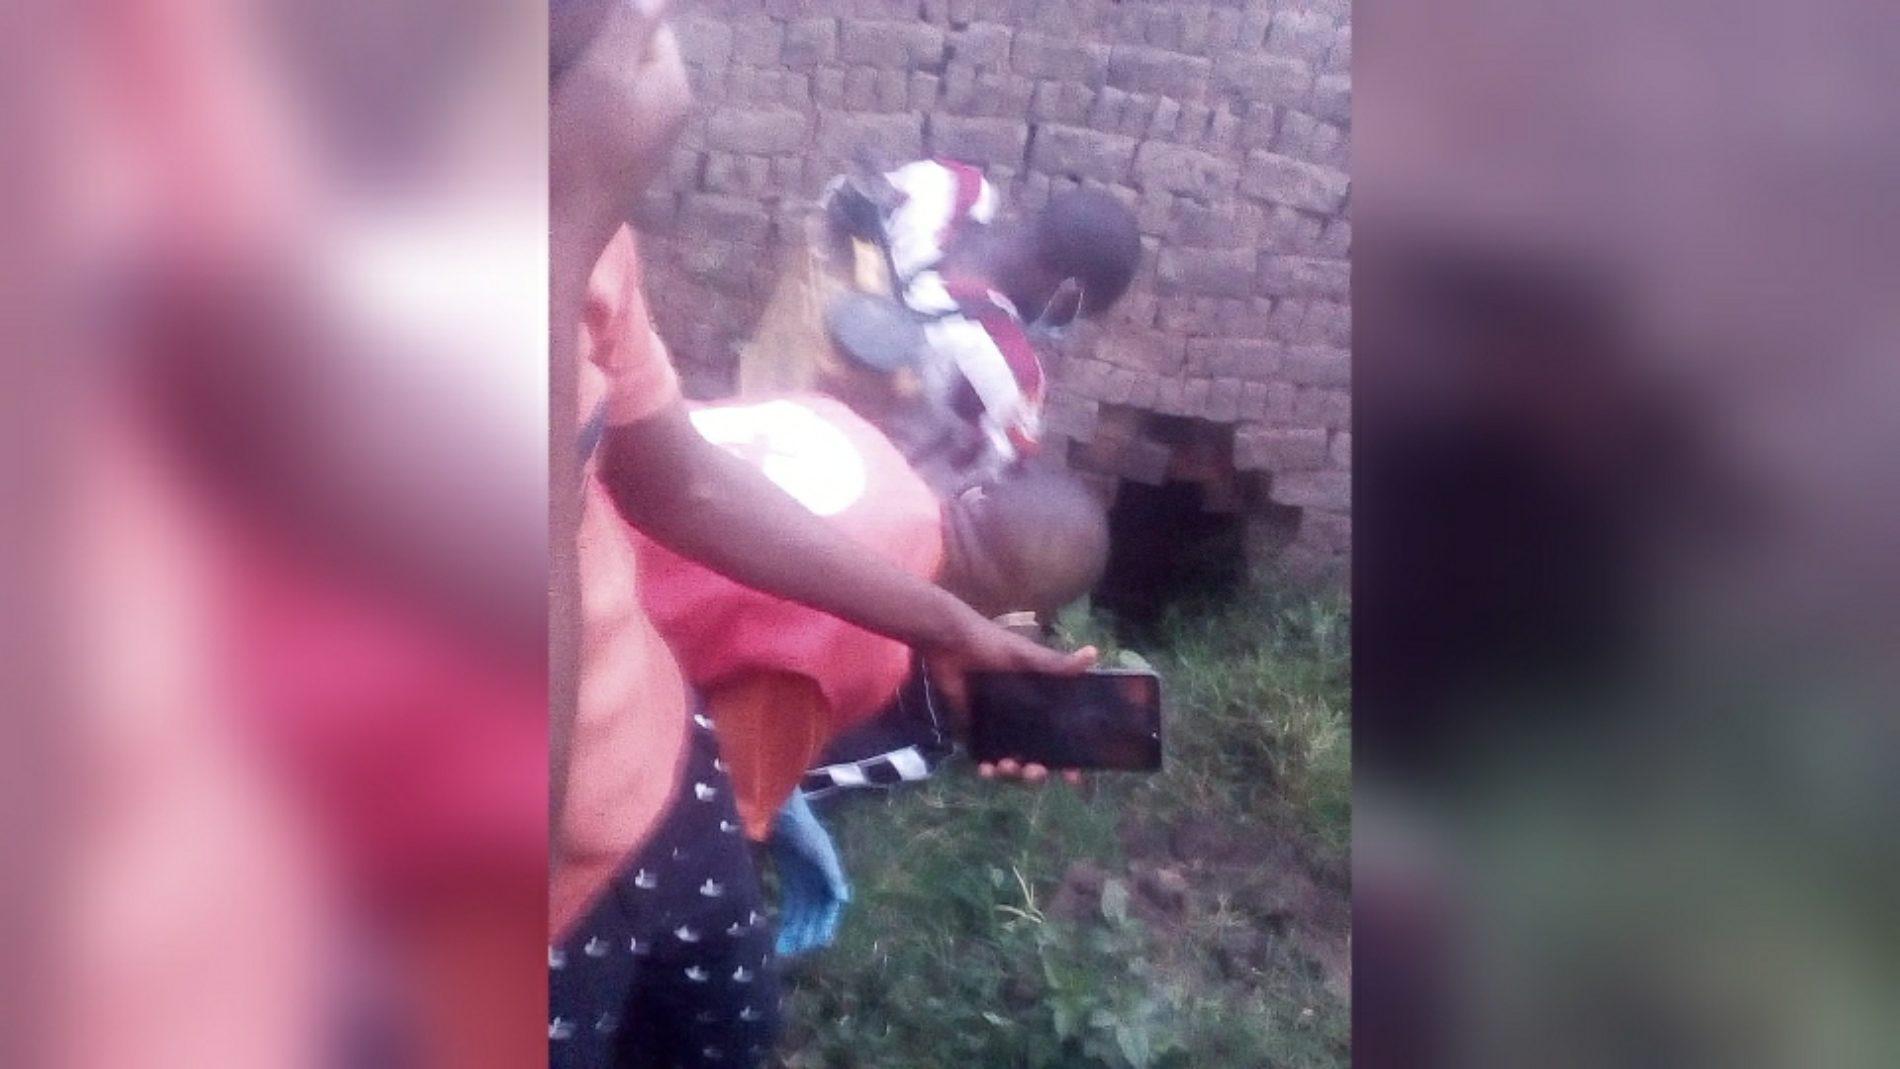 Mugina : découverte d'un corps à Buziranyundo